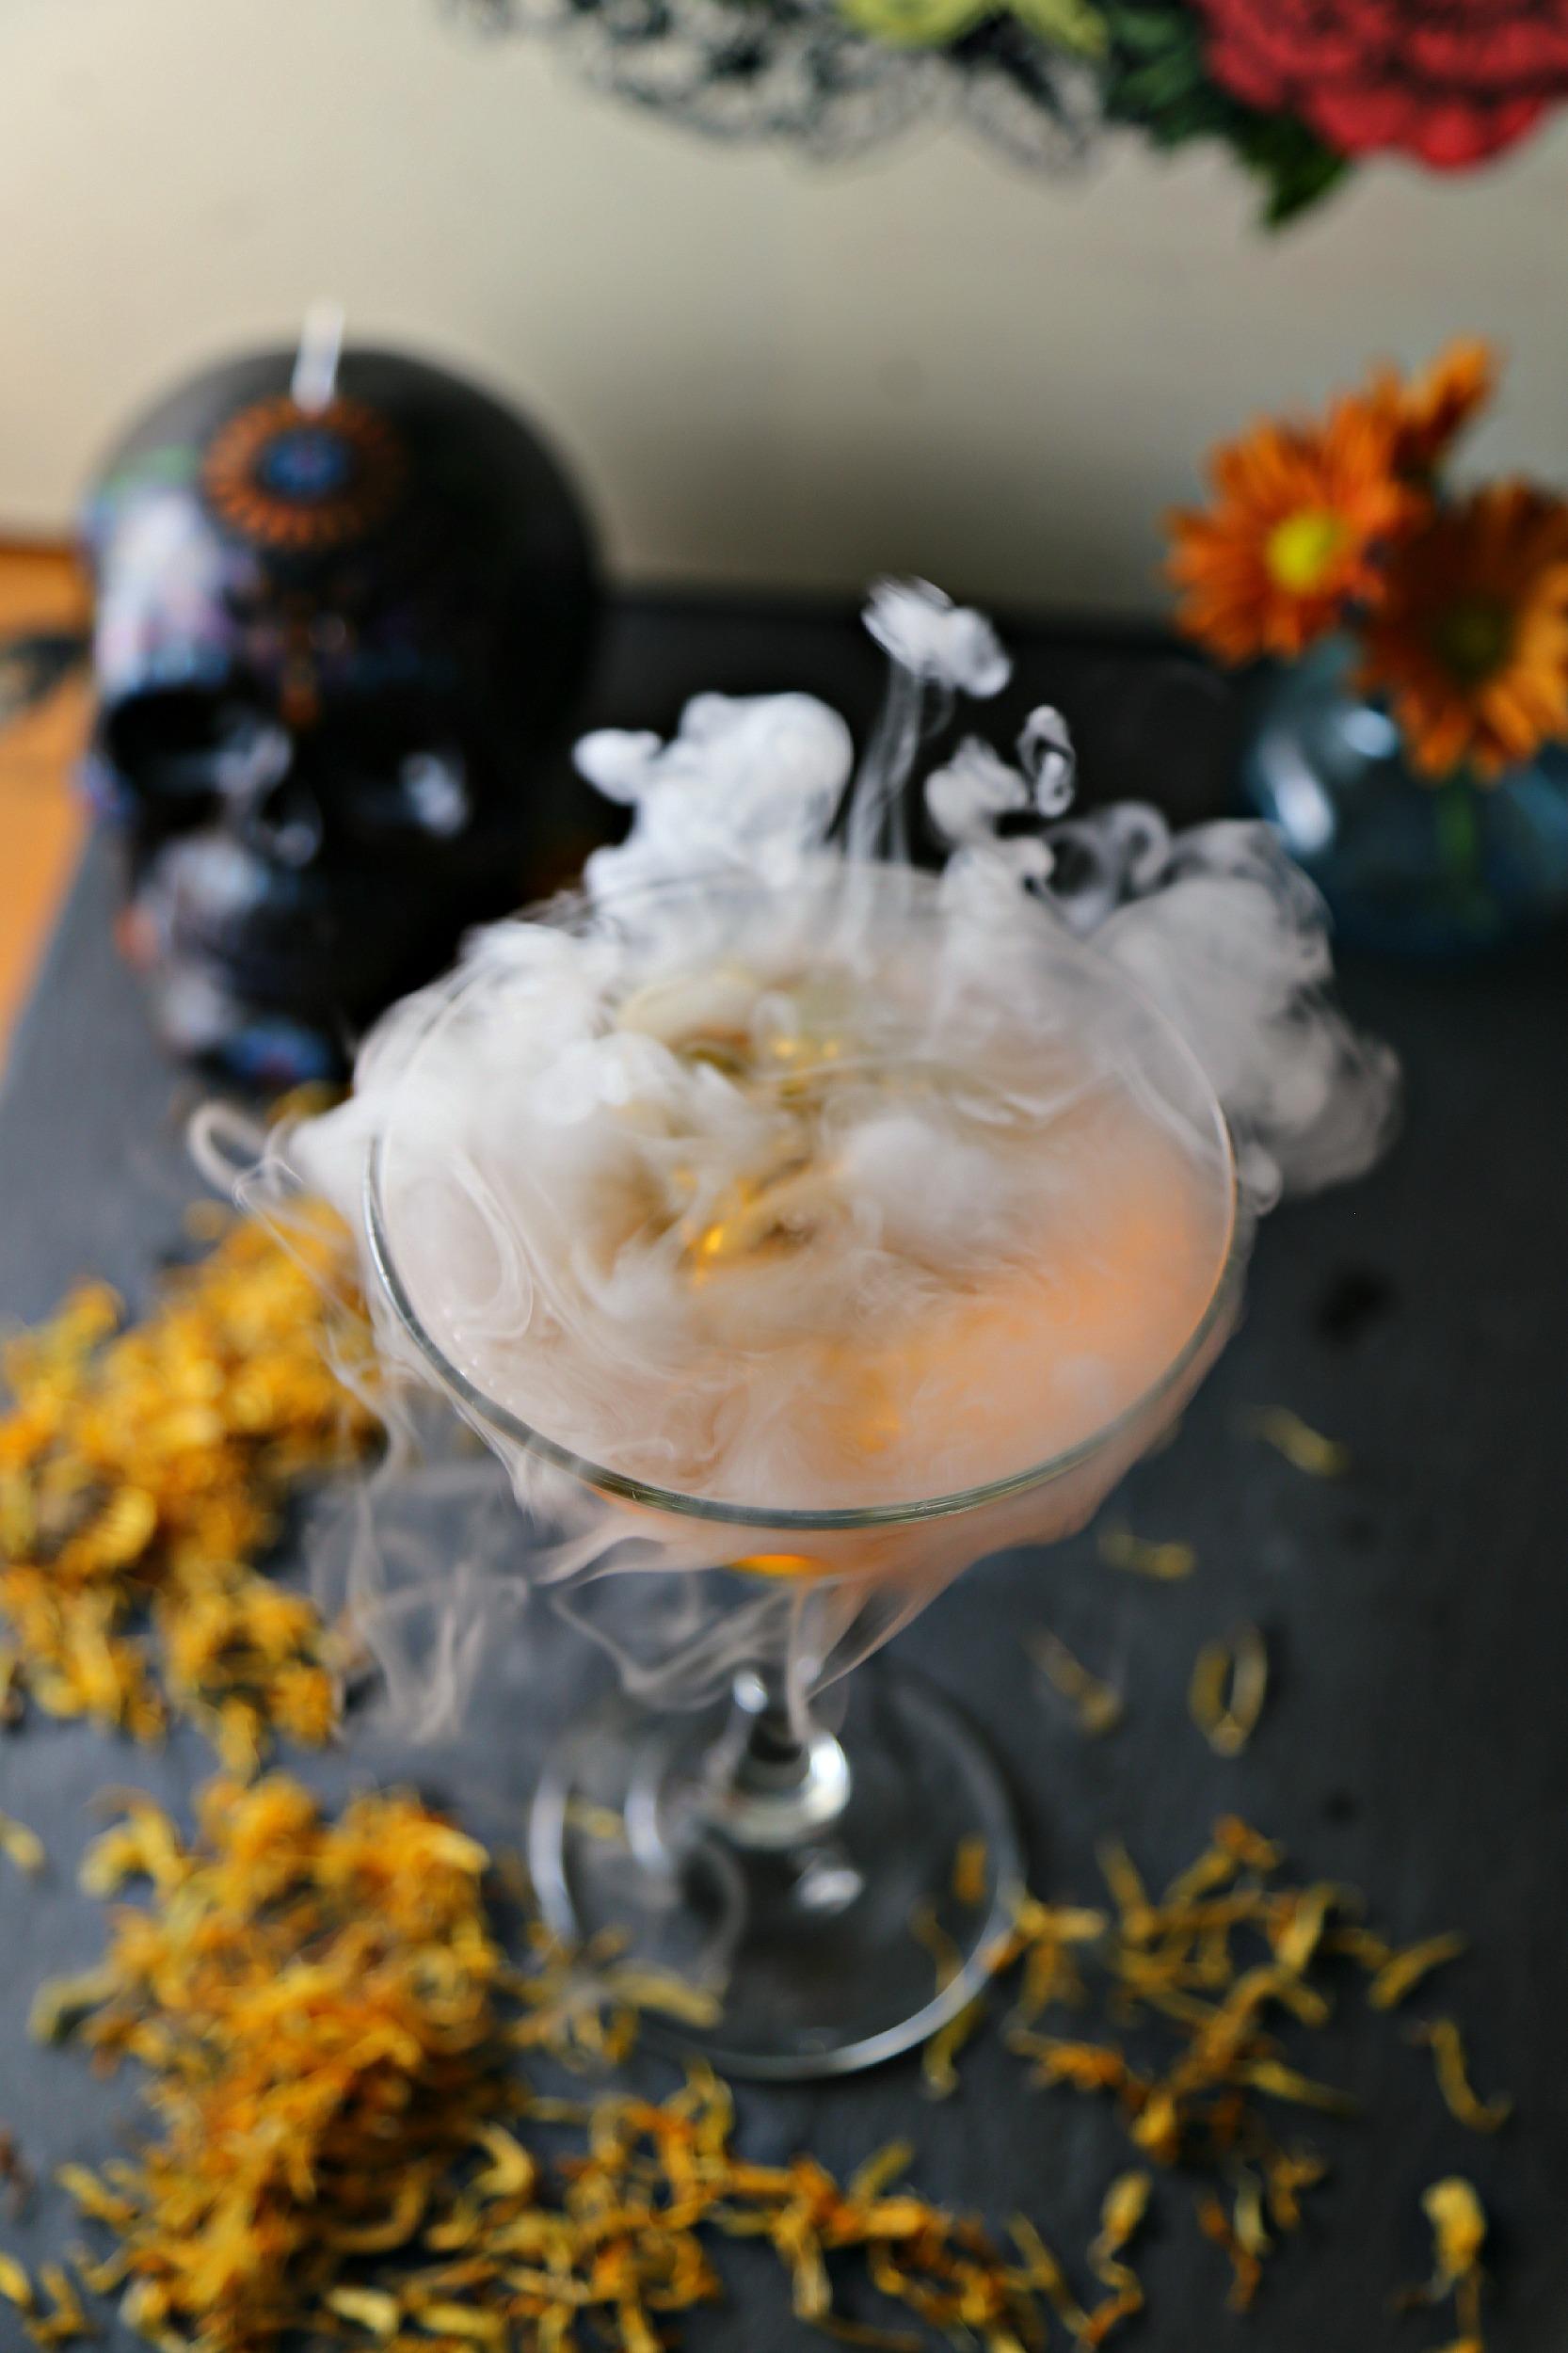 marigold-infused-vodka-marigold-martini-vianneyrodriguez-sweetlifebake